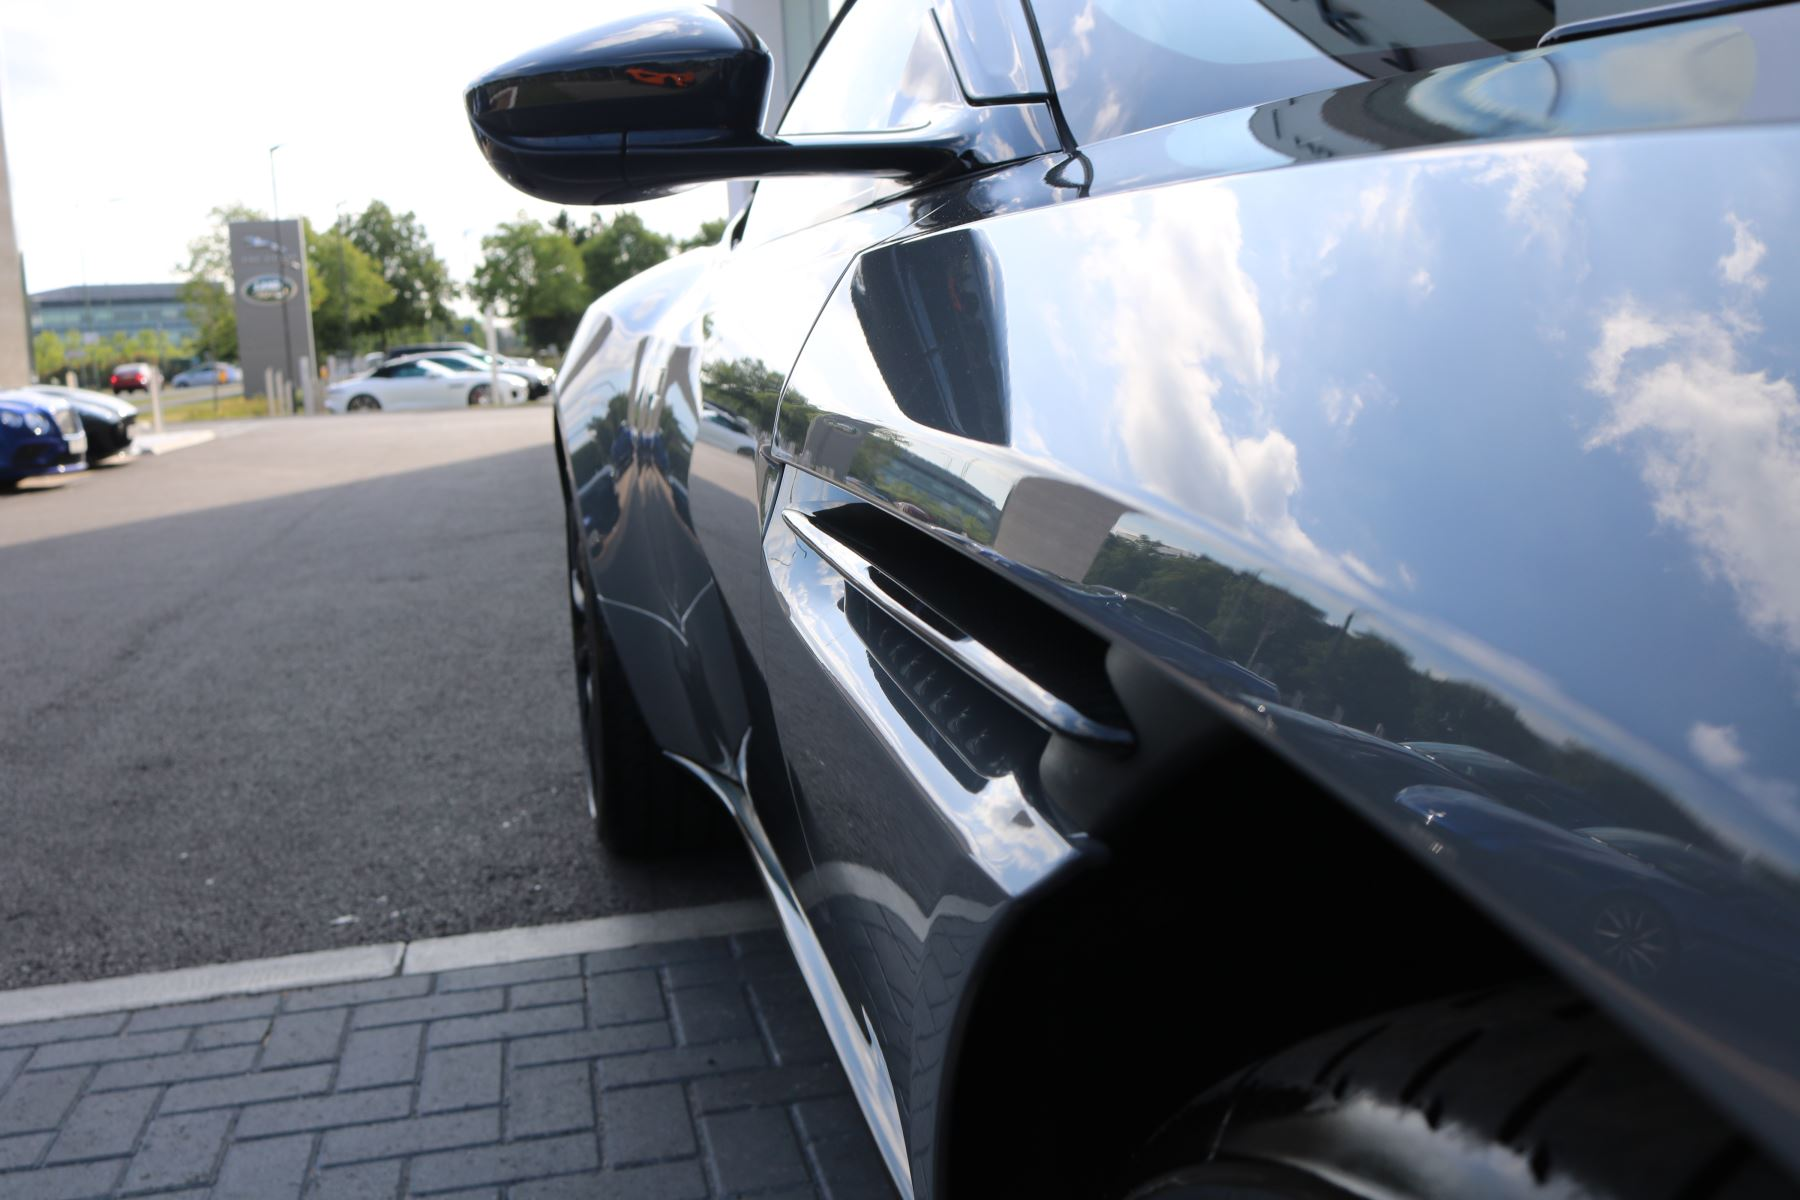 Aston Martin DB11 V12 AMR 2dr Touchtronic image 6